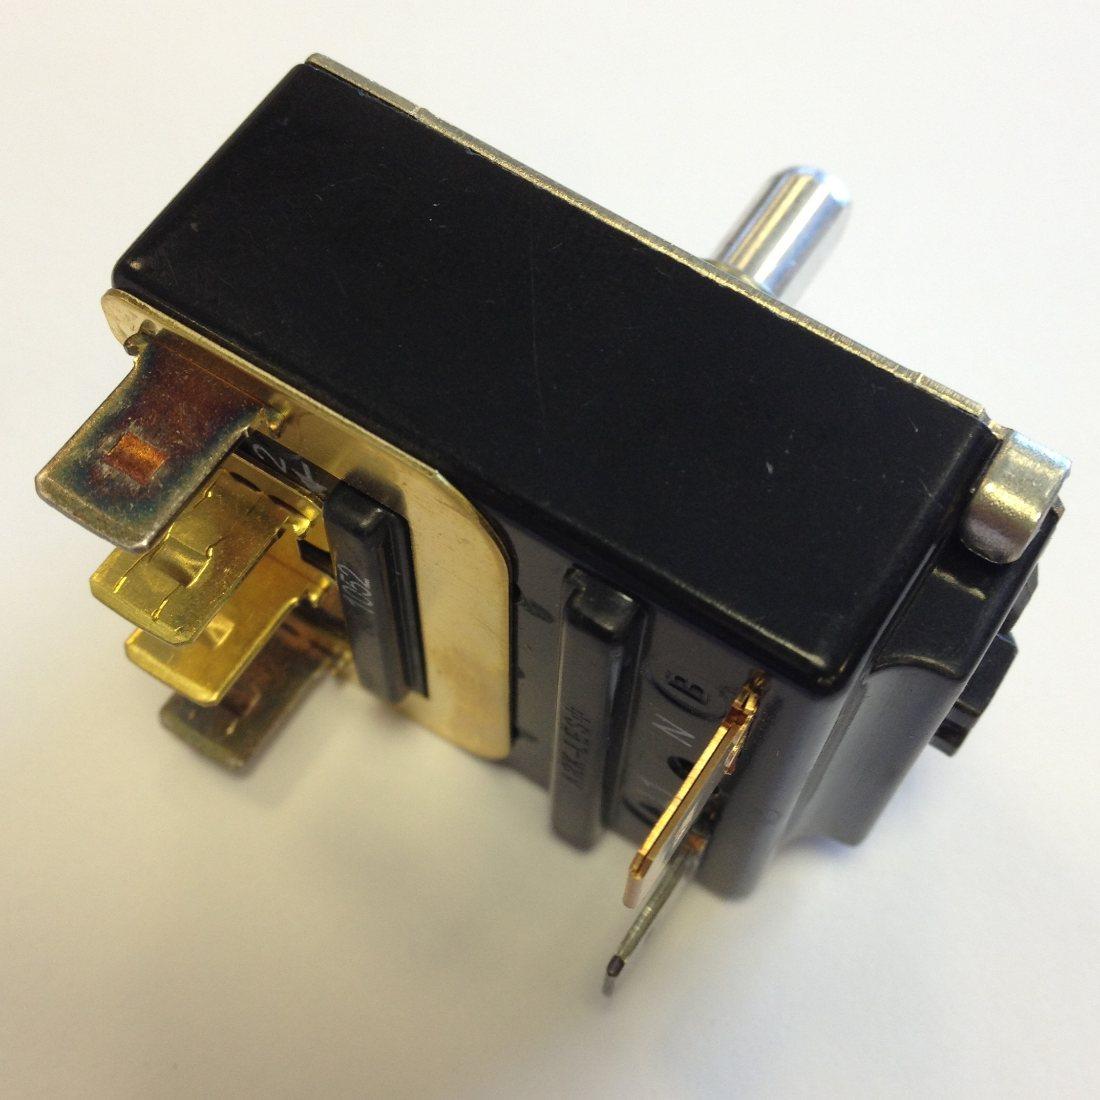 Motor Guide 5 Speed Foot Switch